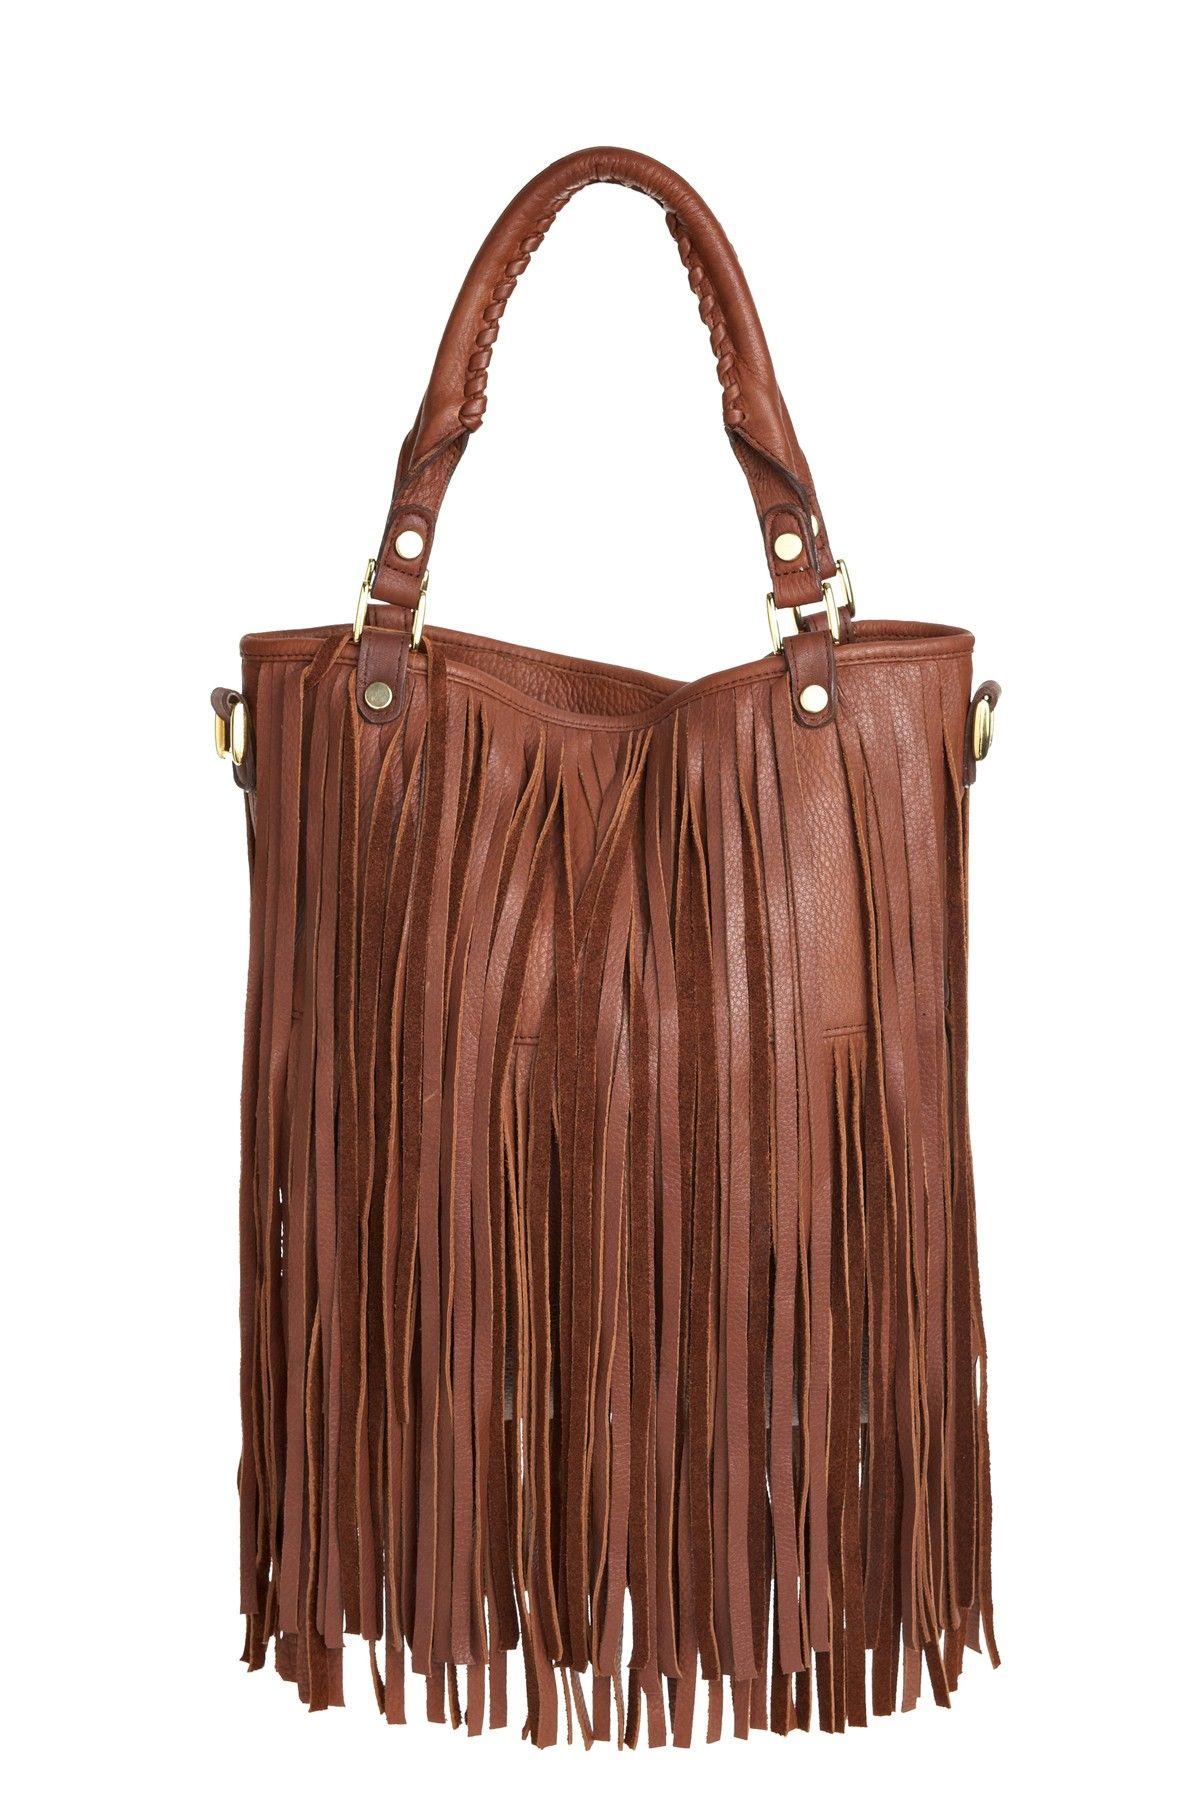 Twiggy Fringe Handbag (With images) Trendy handbags